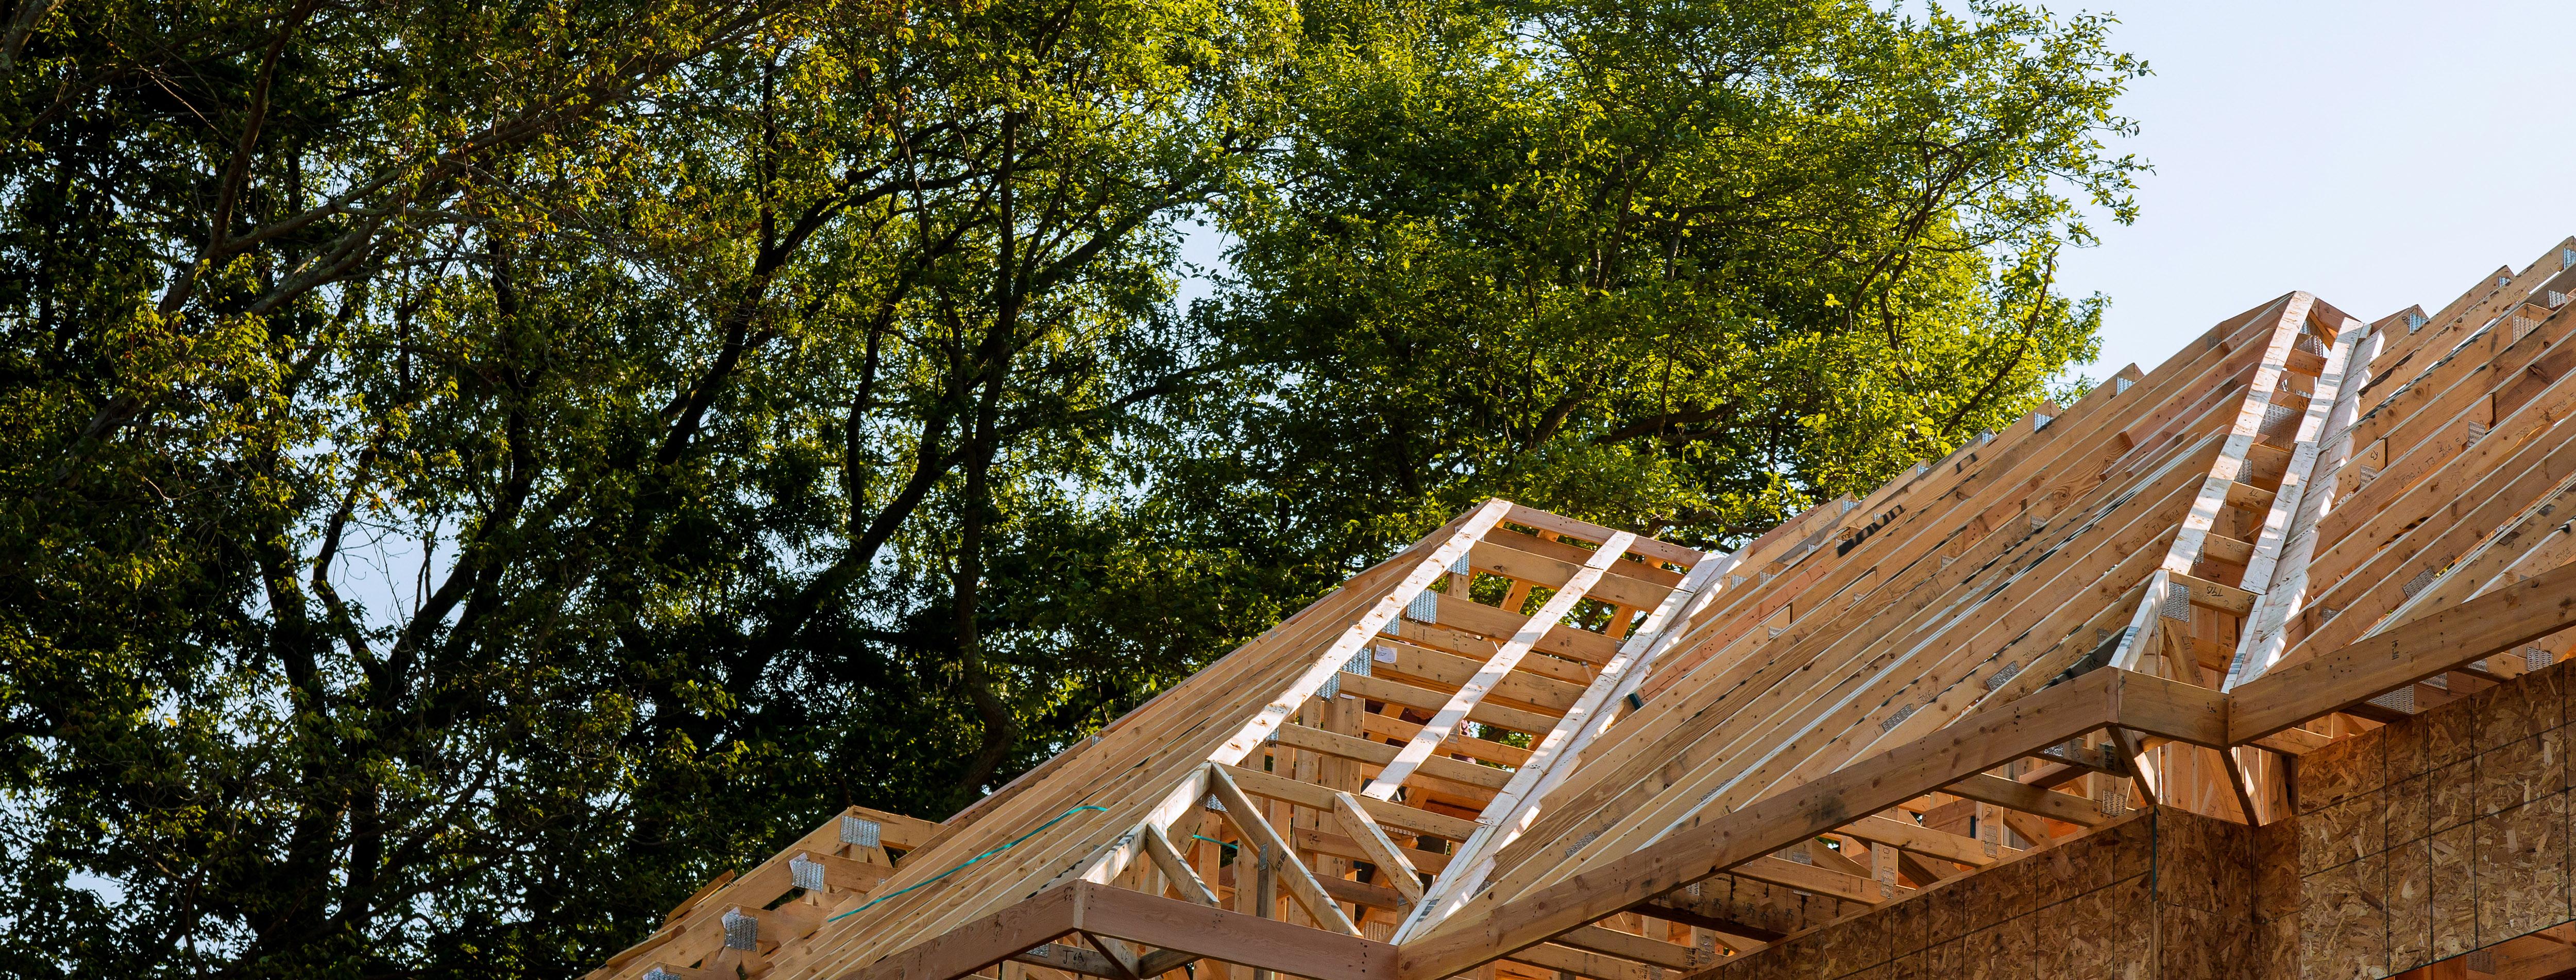 Framing beam of new house under construction home framing